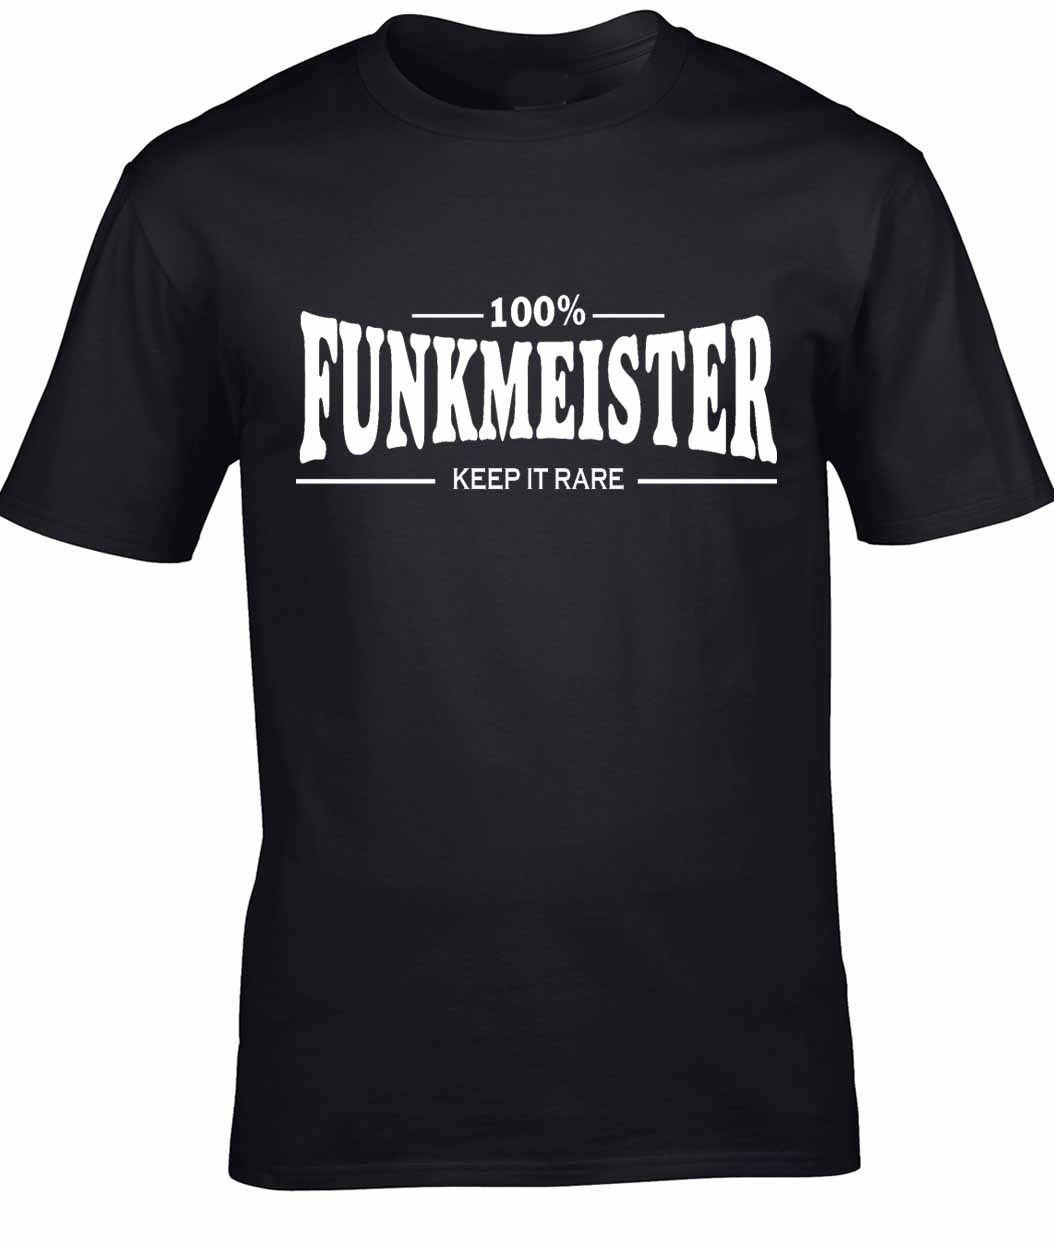 Tanz Funk Shirt T 3xl Witzig Disko Selten Rillen Herren 4xl 5xl qq7wfxv